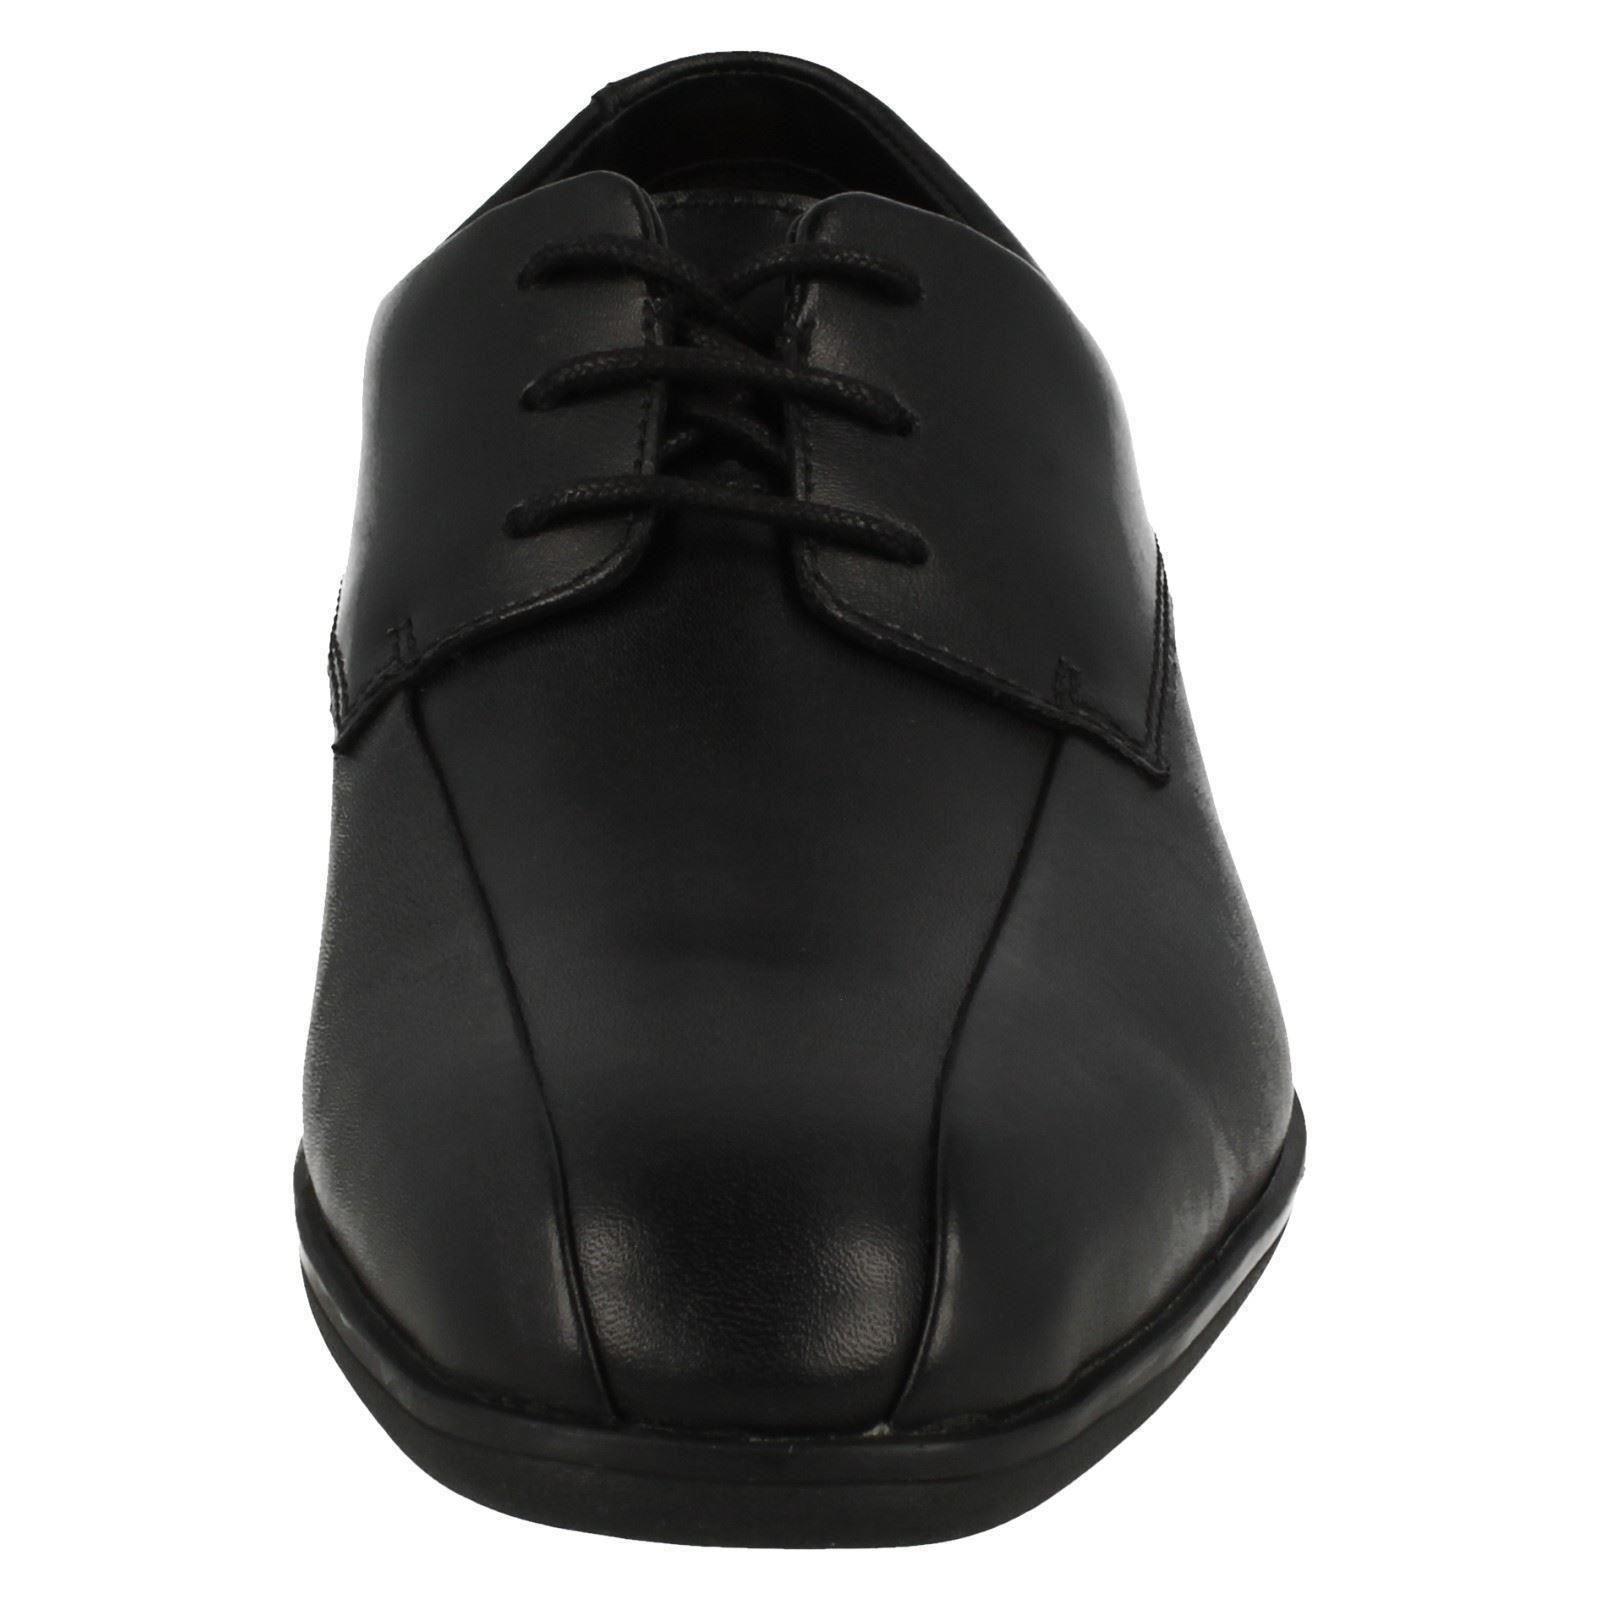 Boys-Clarks-School-Shoes-039-Willis-Lad-039